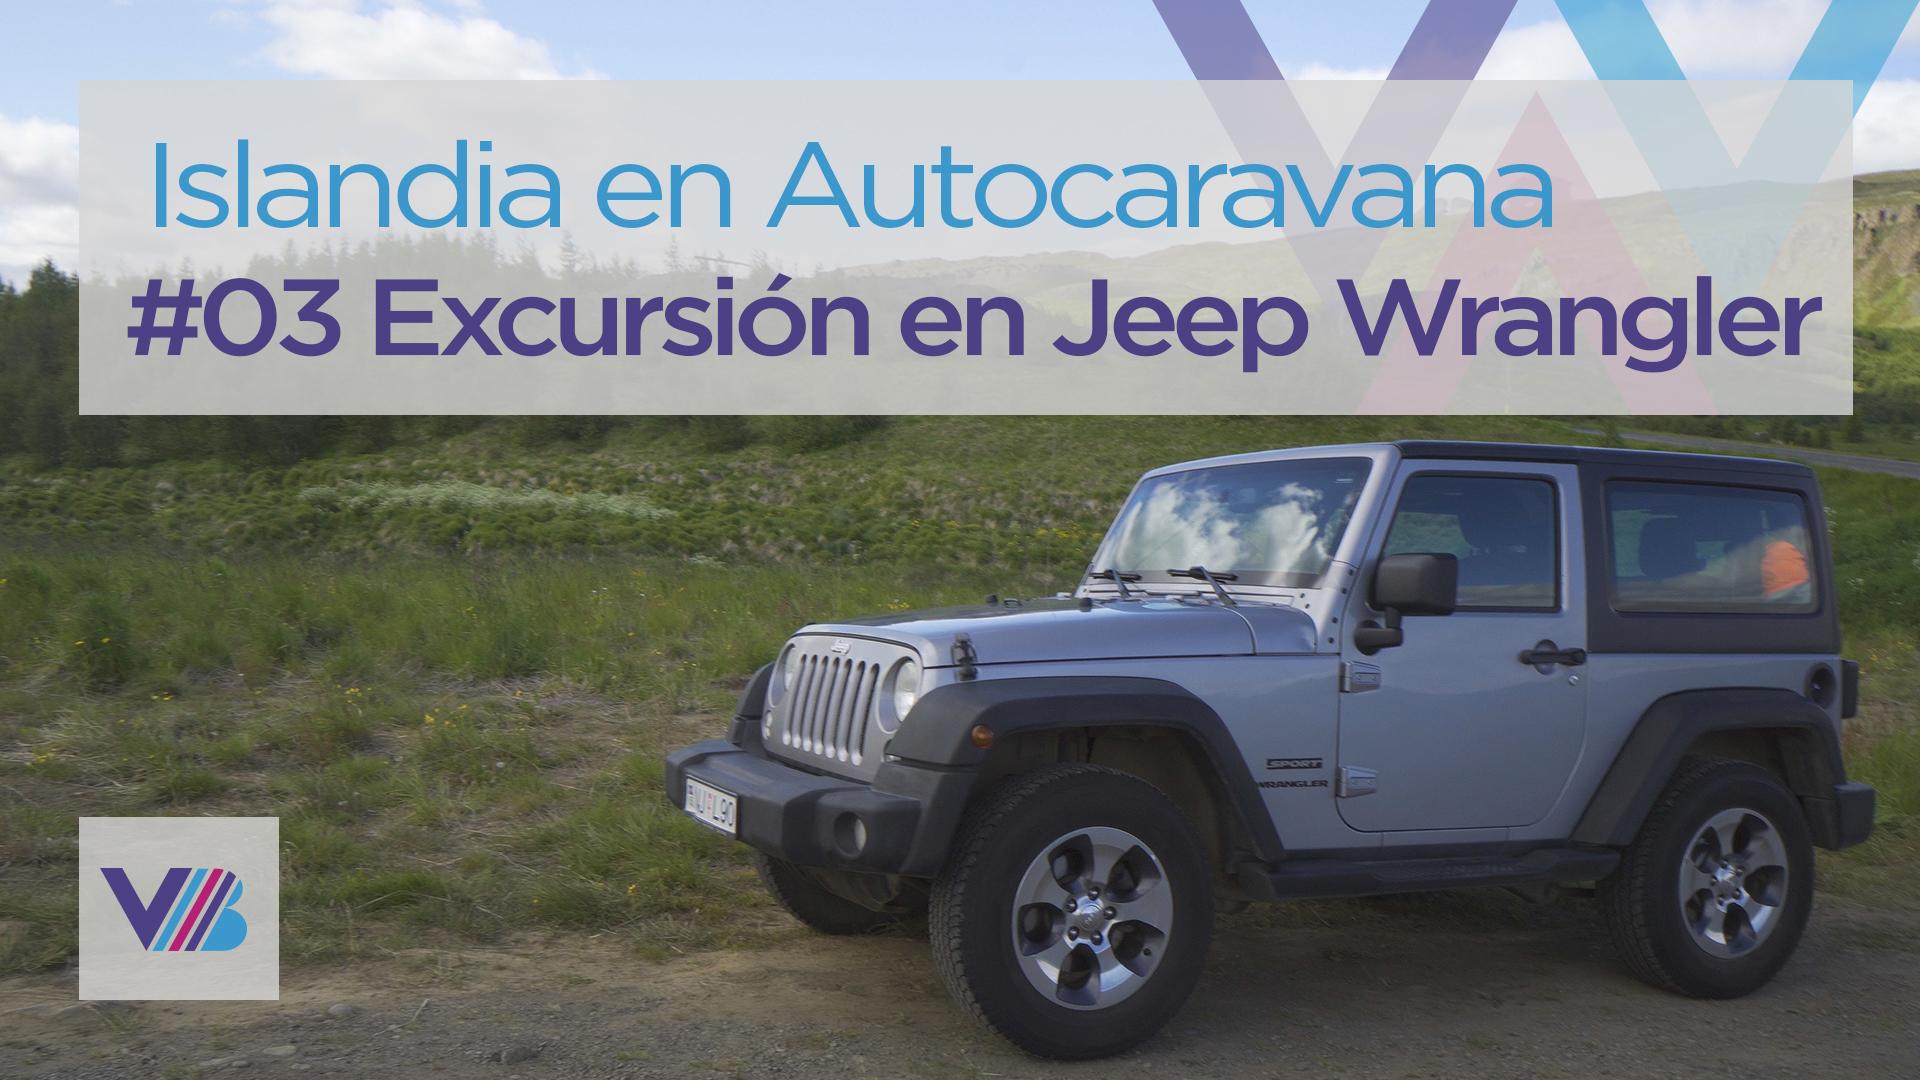 Excursión en Jeep Wrangler por Islandia